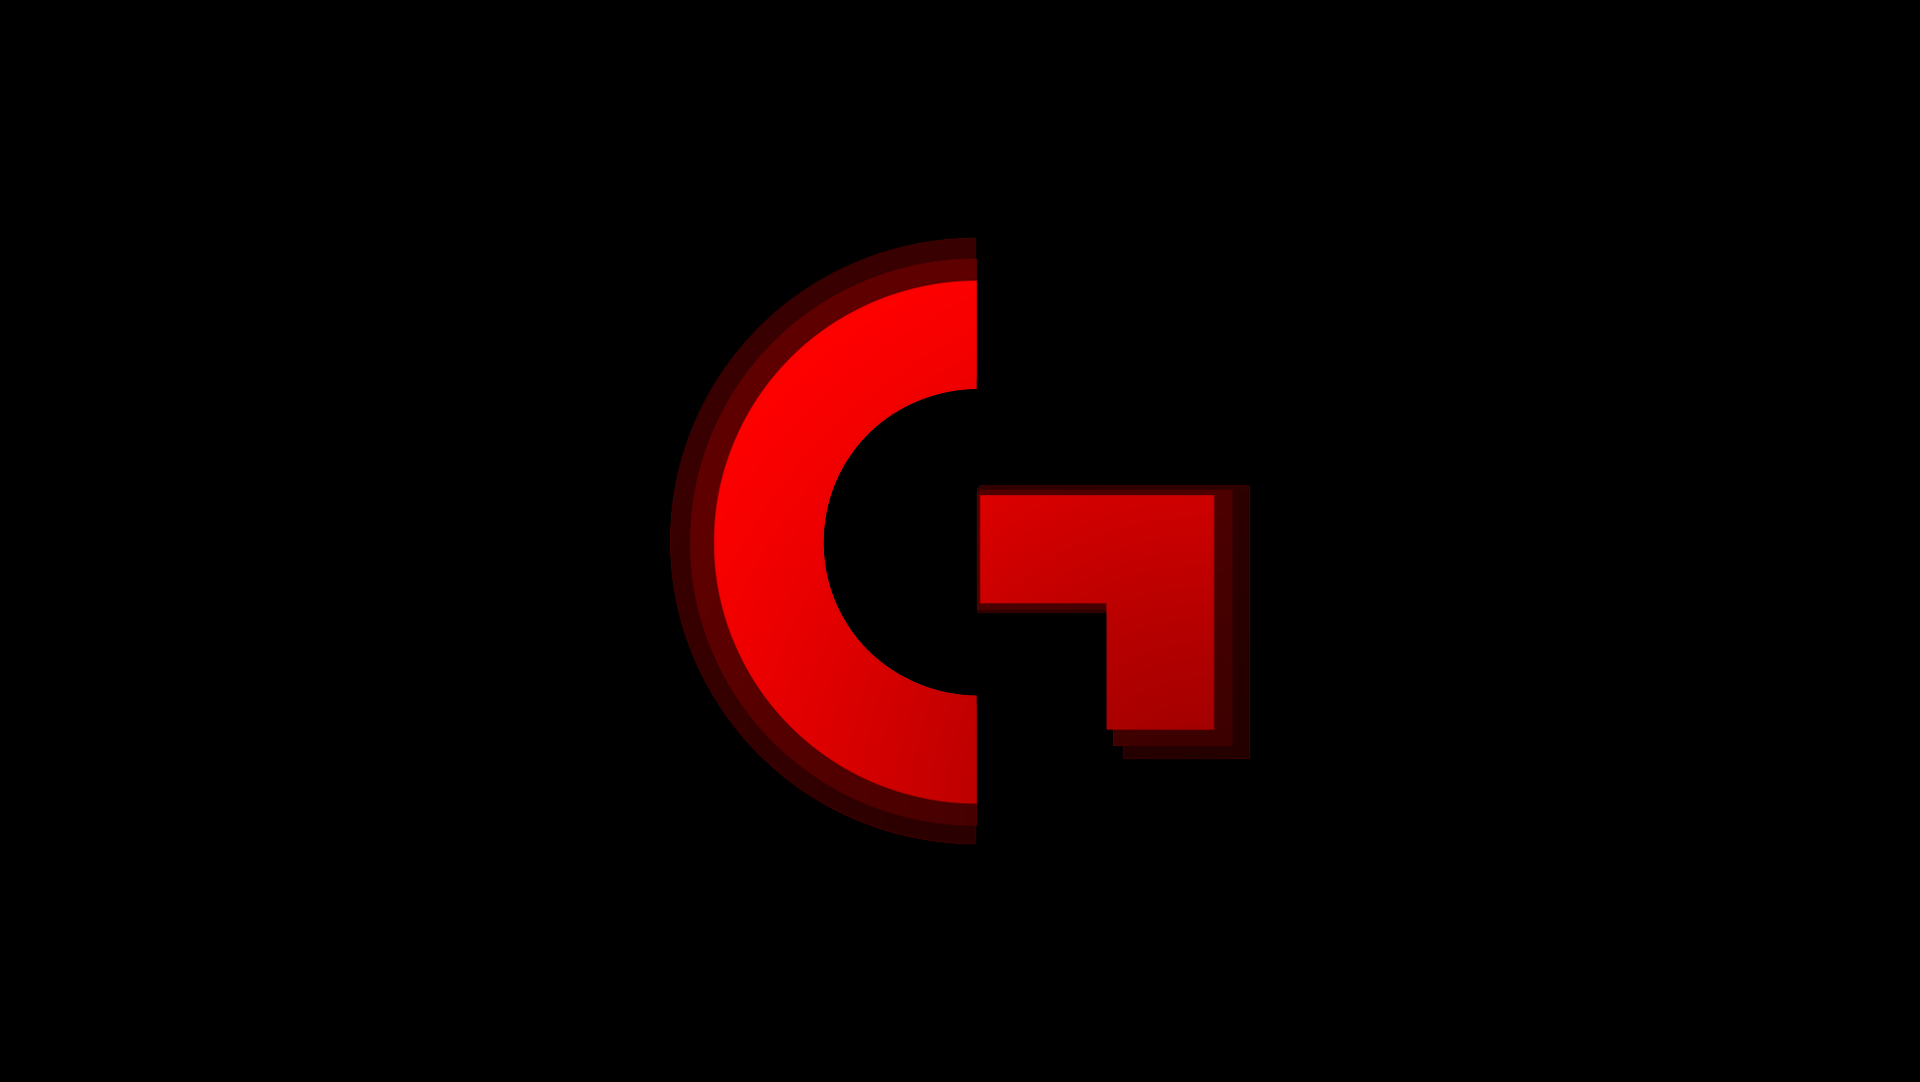 Logitech G Red In 2020 Red Wallpaper Red Logo Logo Design